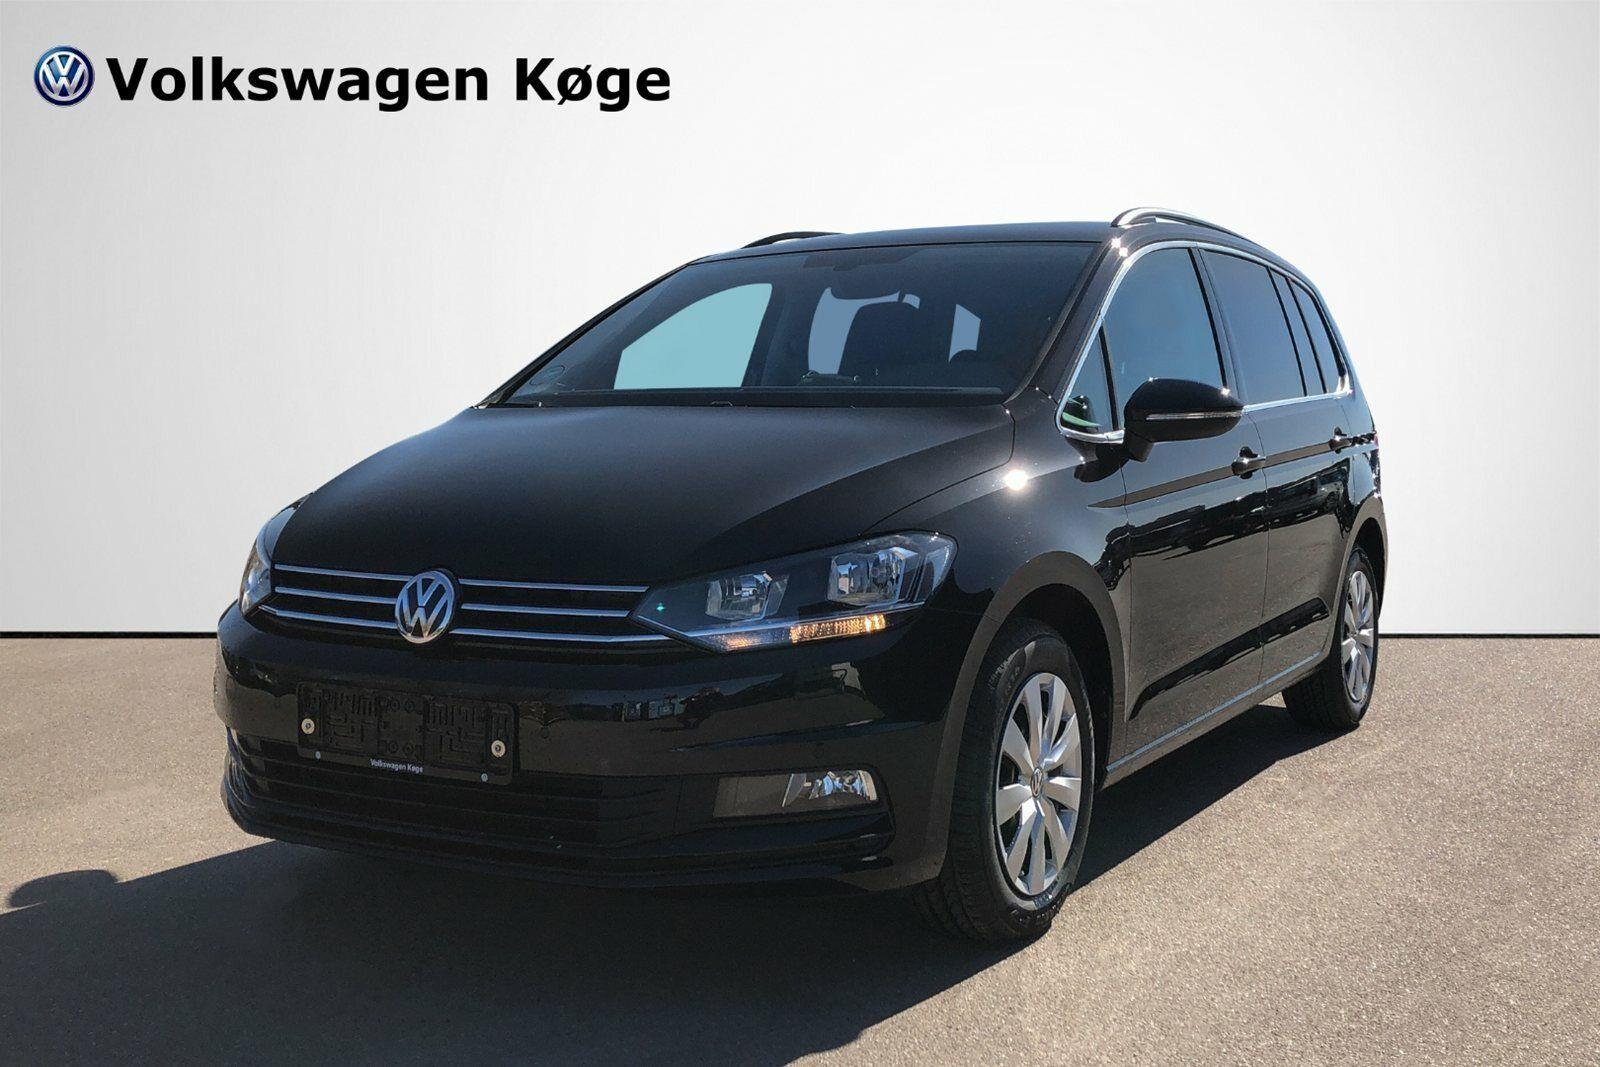 VW Touran 1,6 TDi 115 Comfortl. Connect DSG 5d - 319.900 kr.